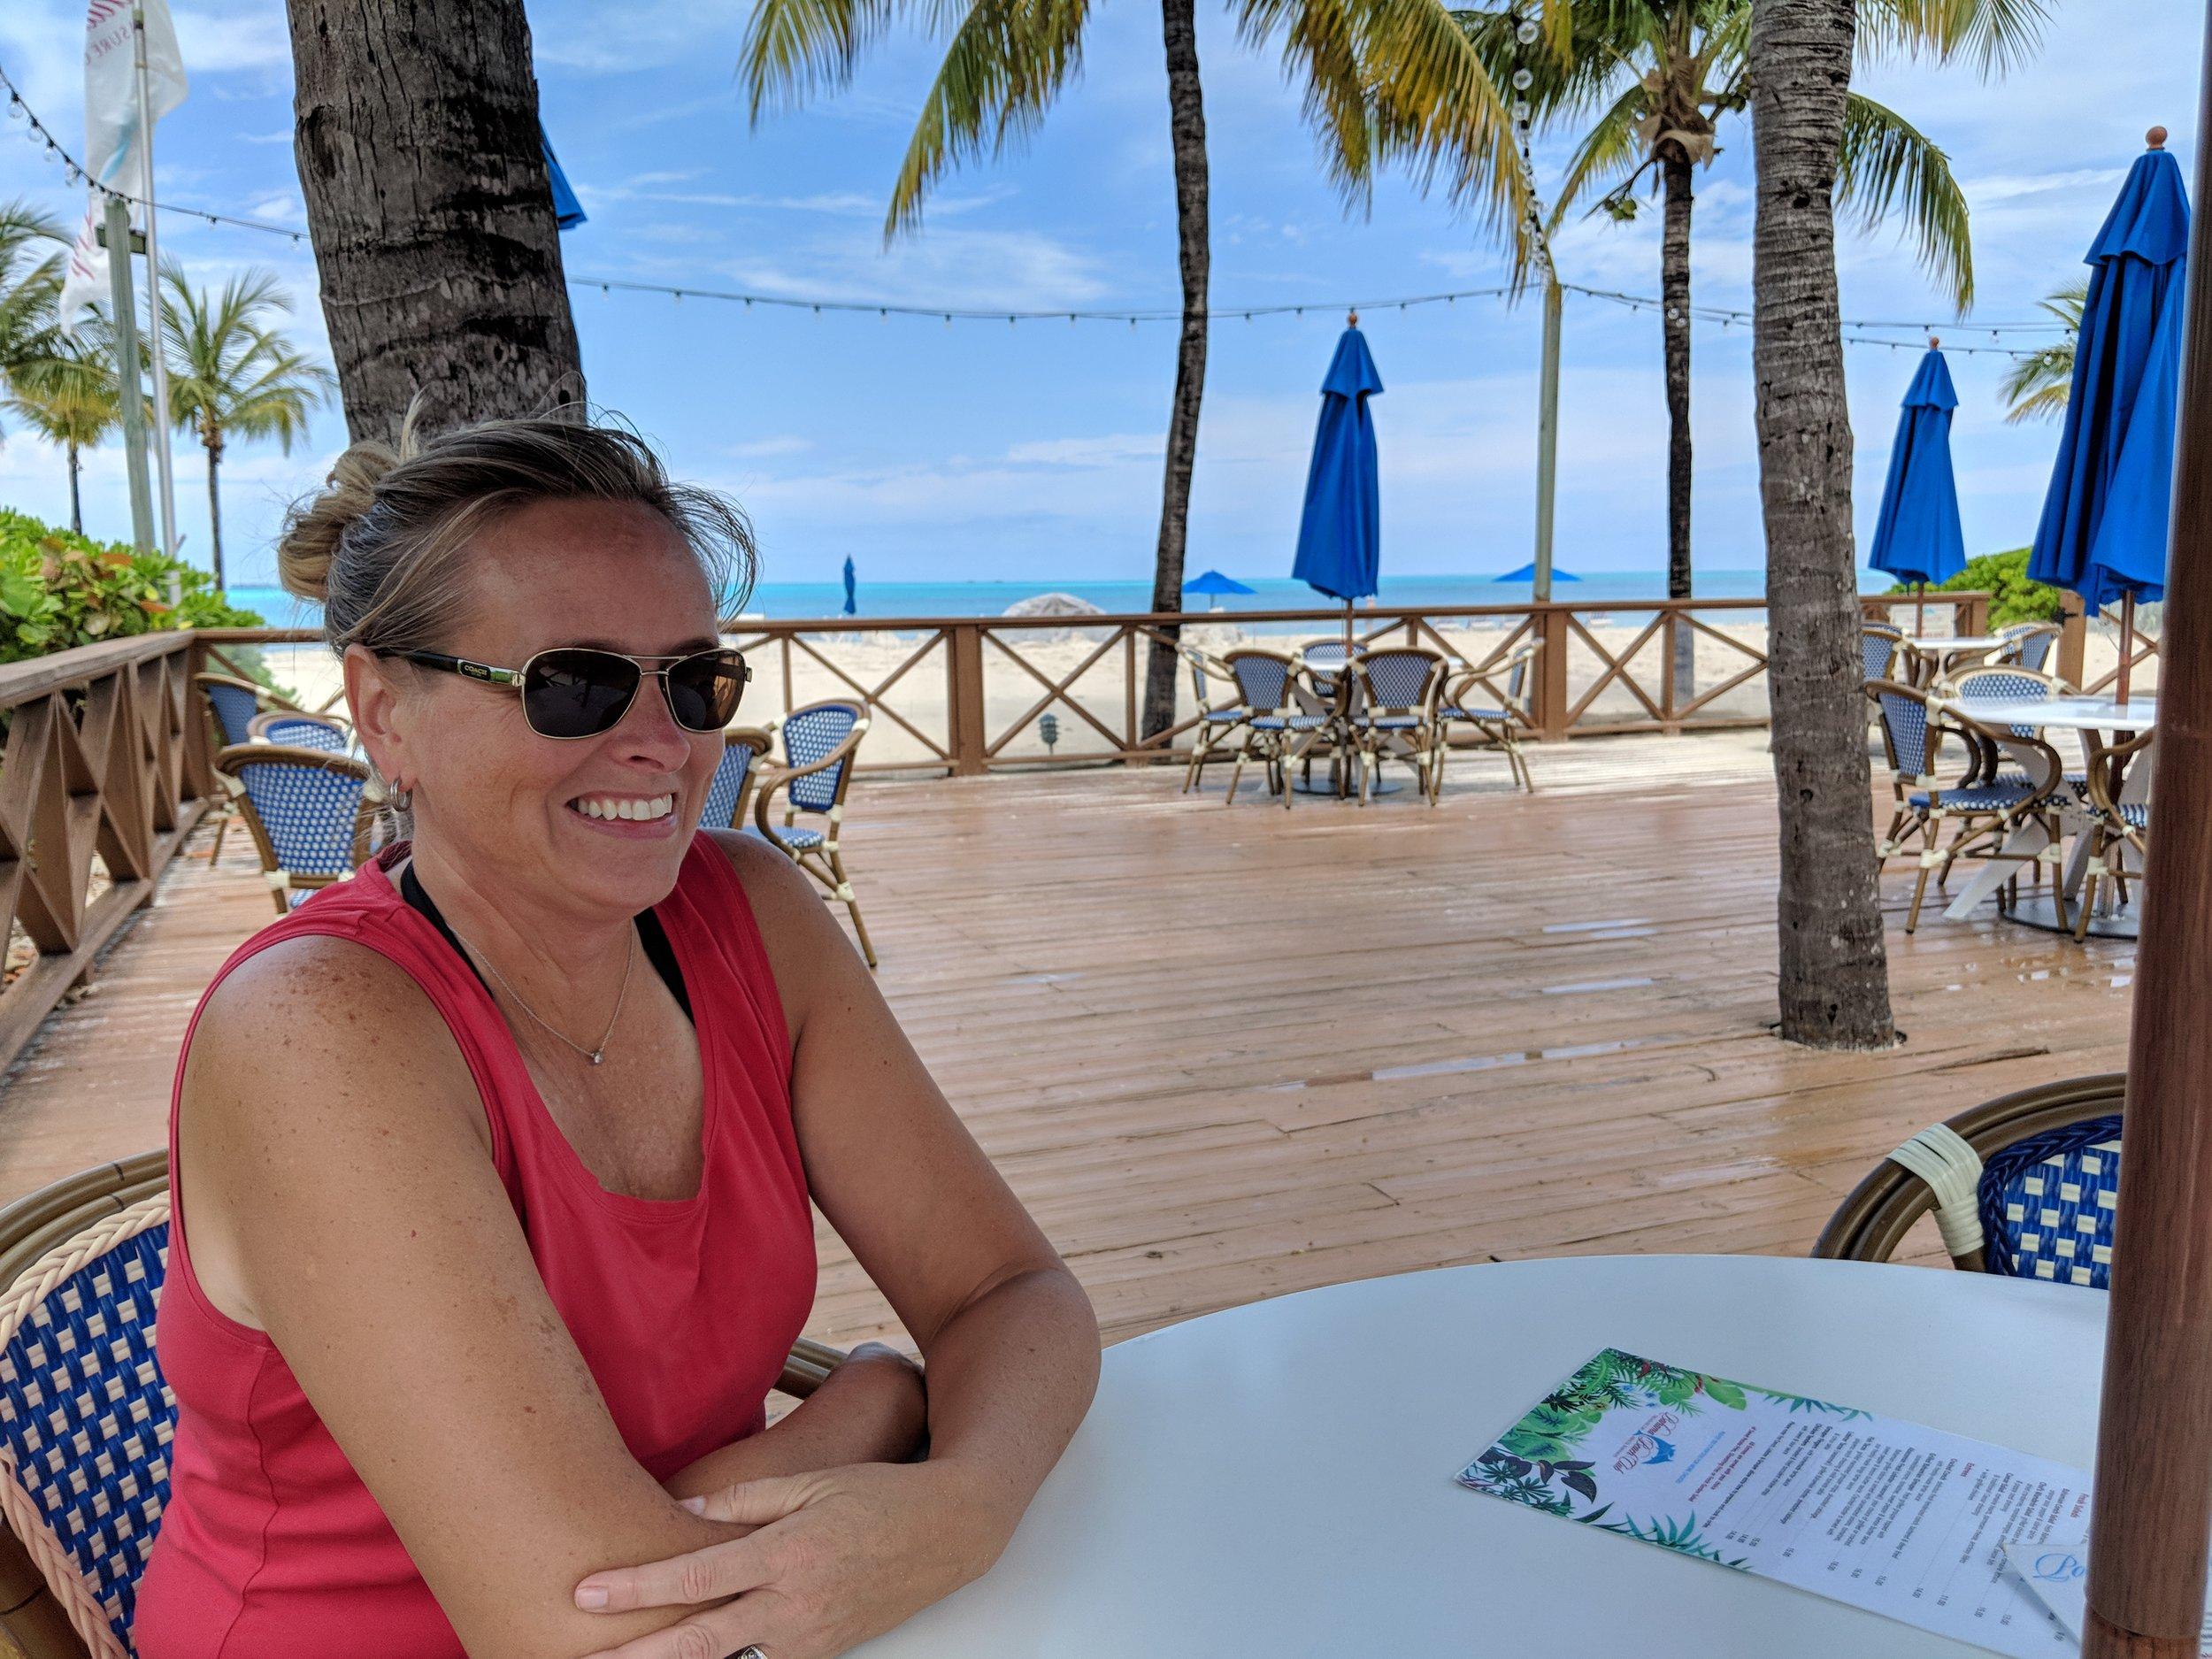 Lunch at Bahamas Beach Club & Resort.